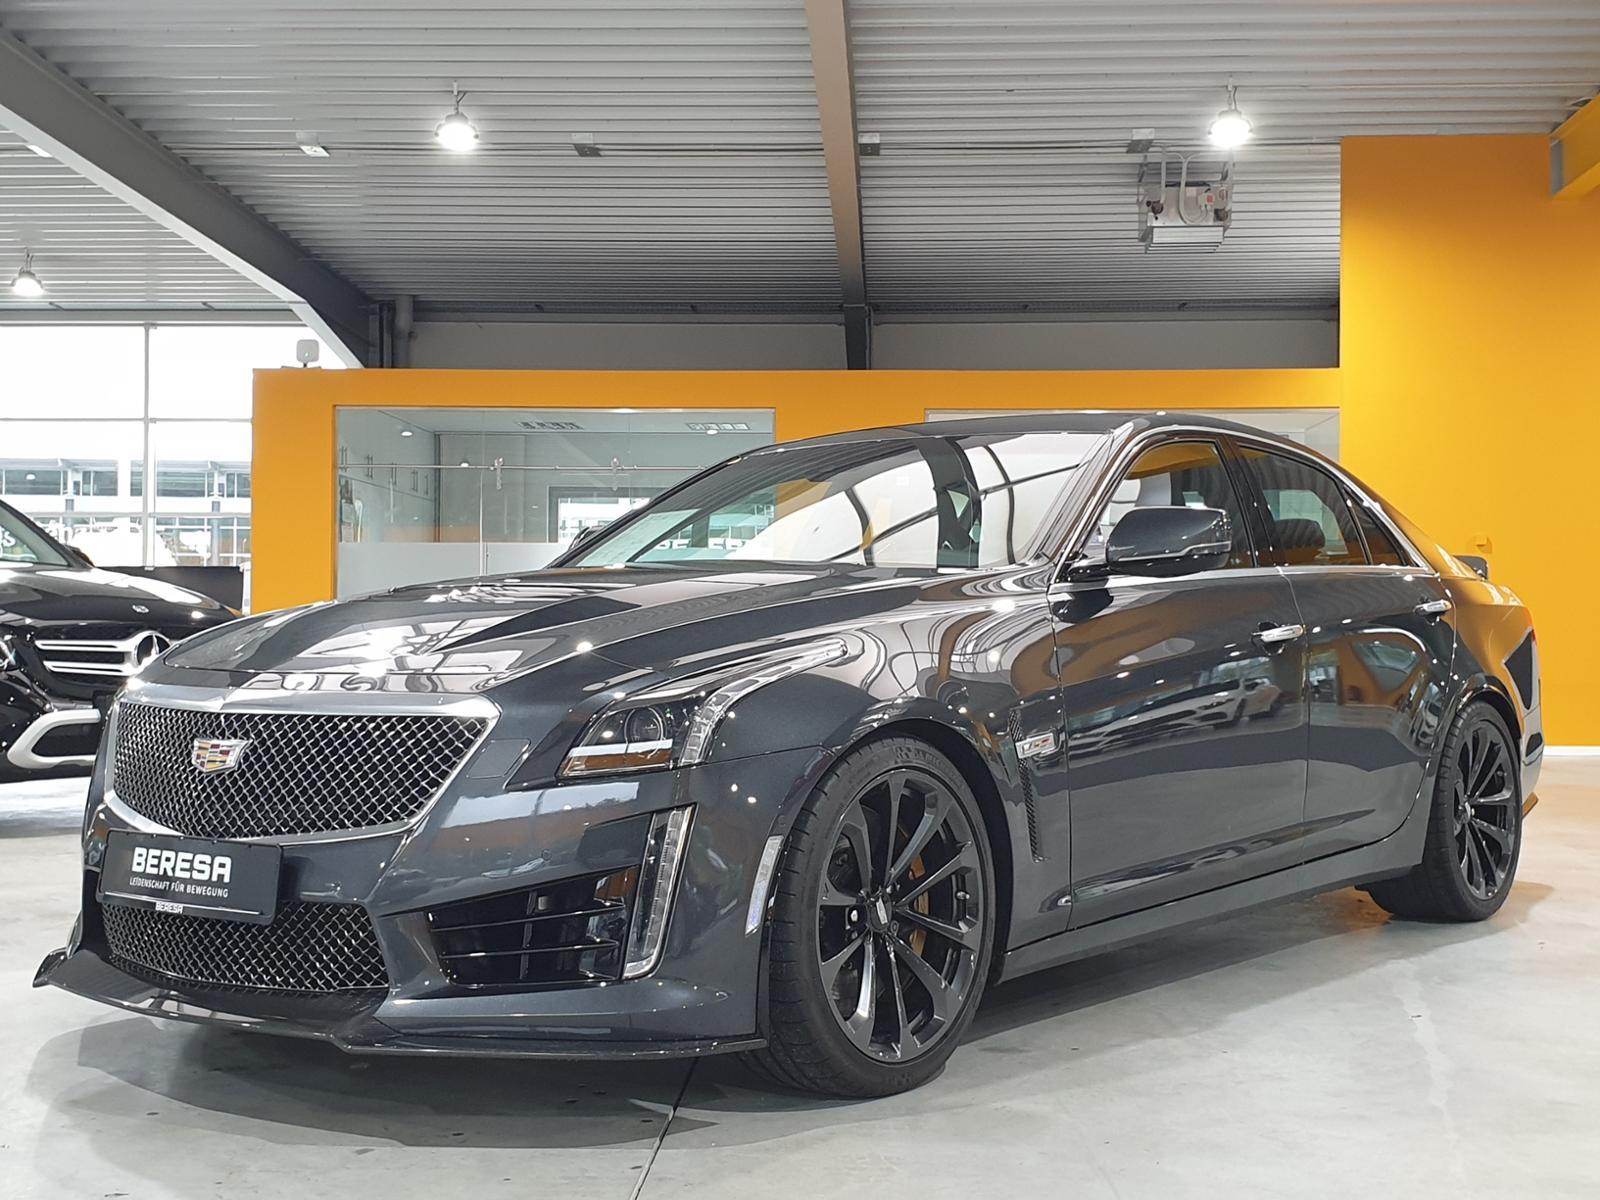 Cadillac CTS-V 6.2 V8 Performance-Sitze SHD Navi BOSE, Jahr 2017, Benzin